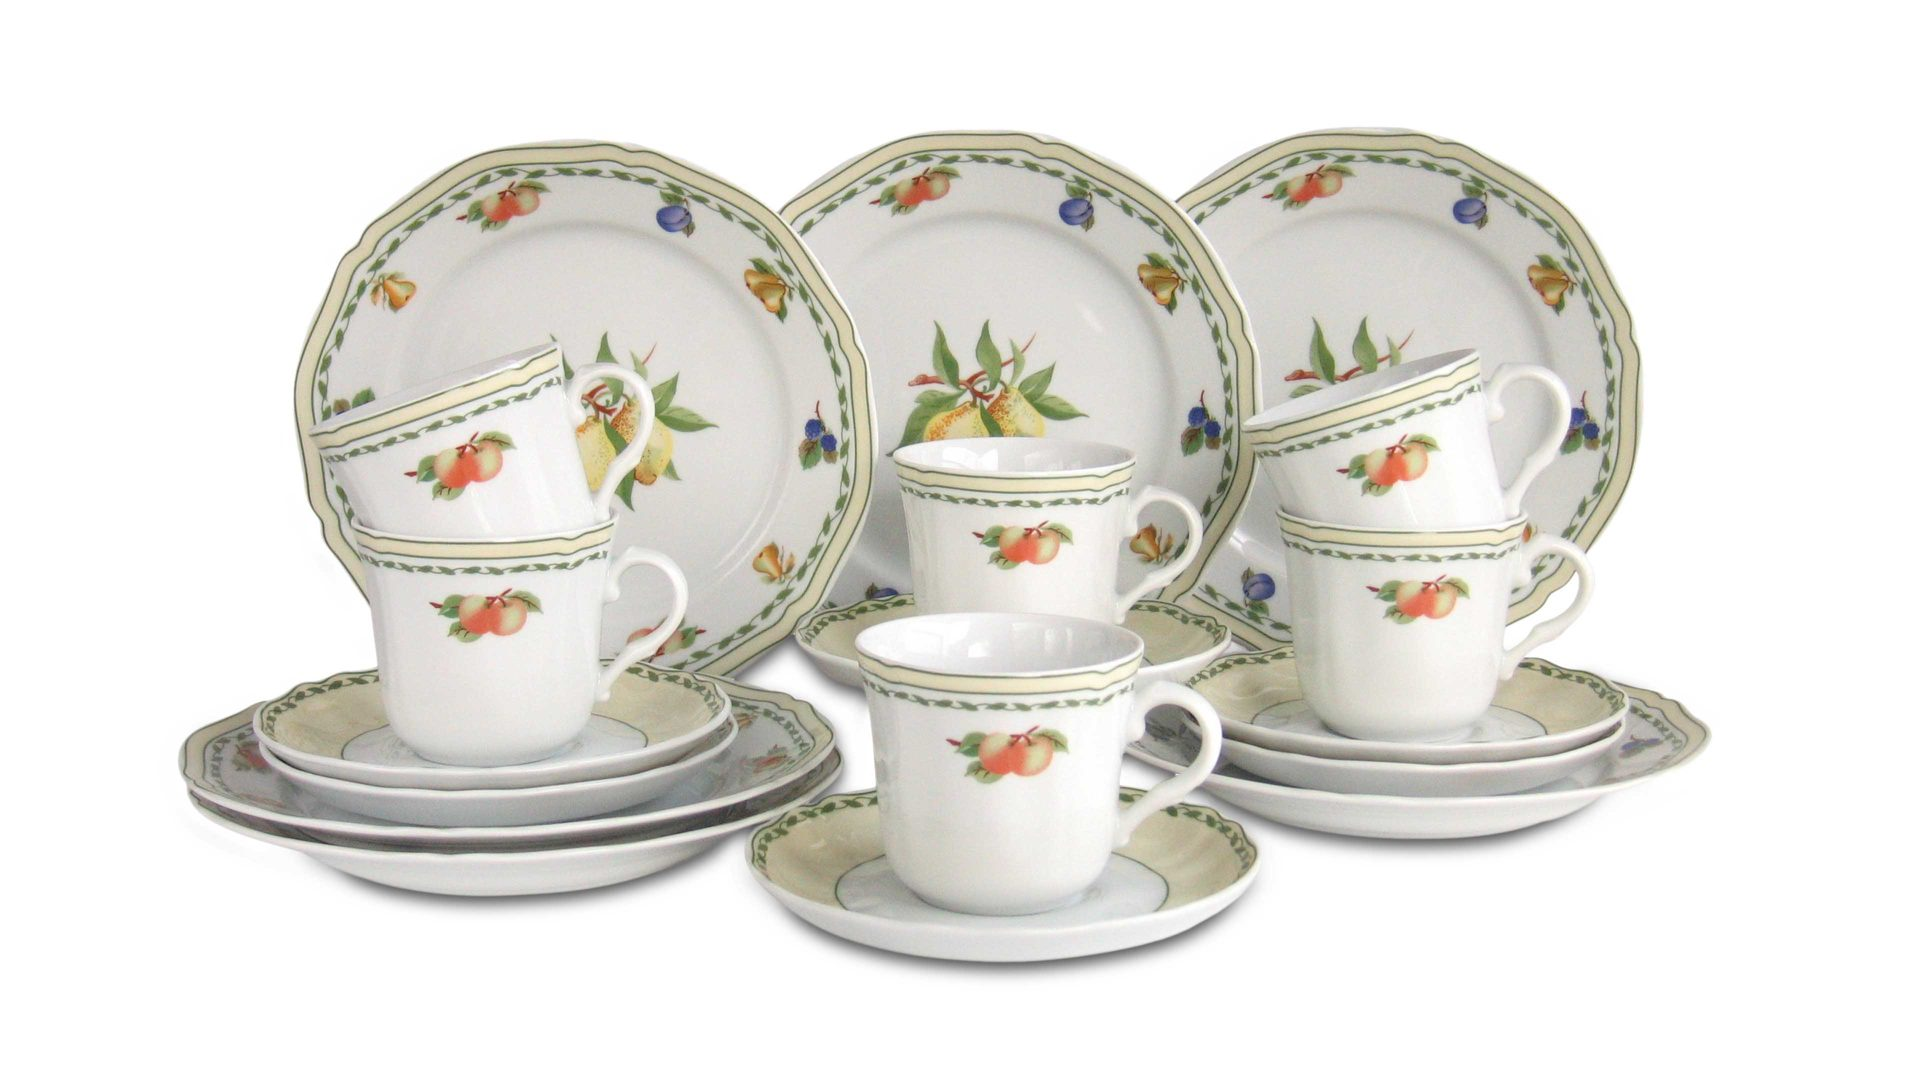 Silvia Kaffeeservice Geschirr Set 18tlg für 6 Personen Porzellan CreaTable 17973